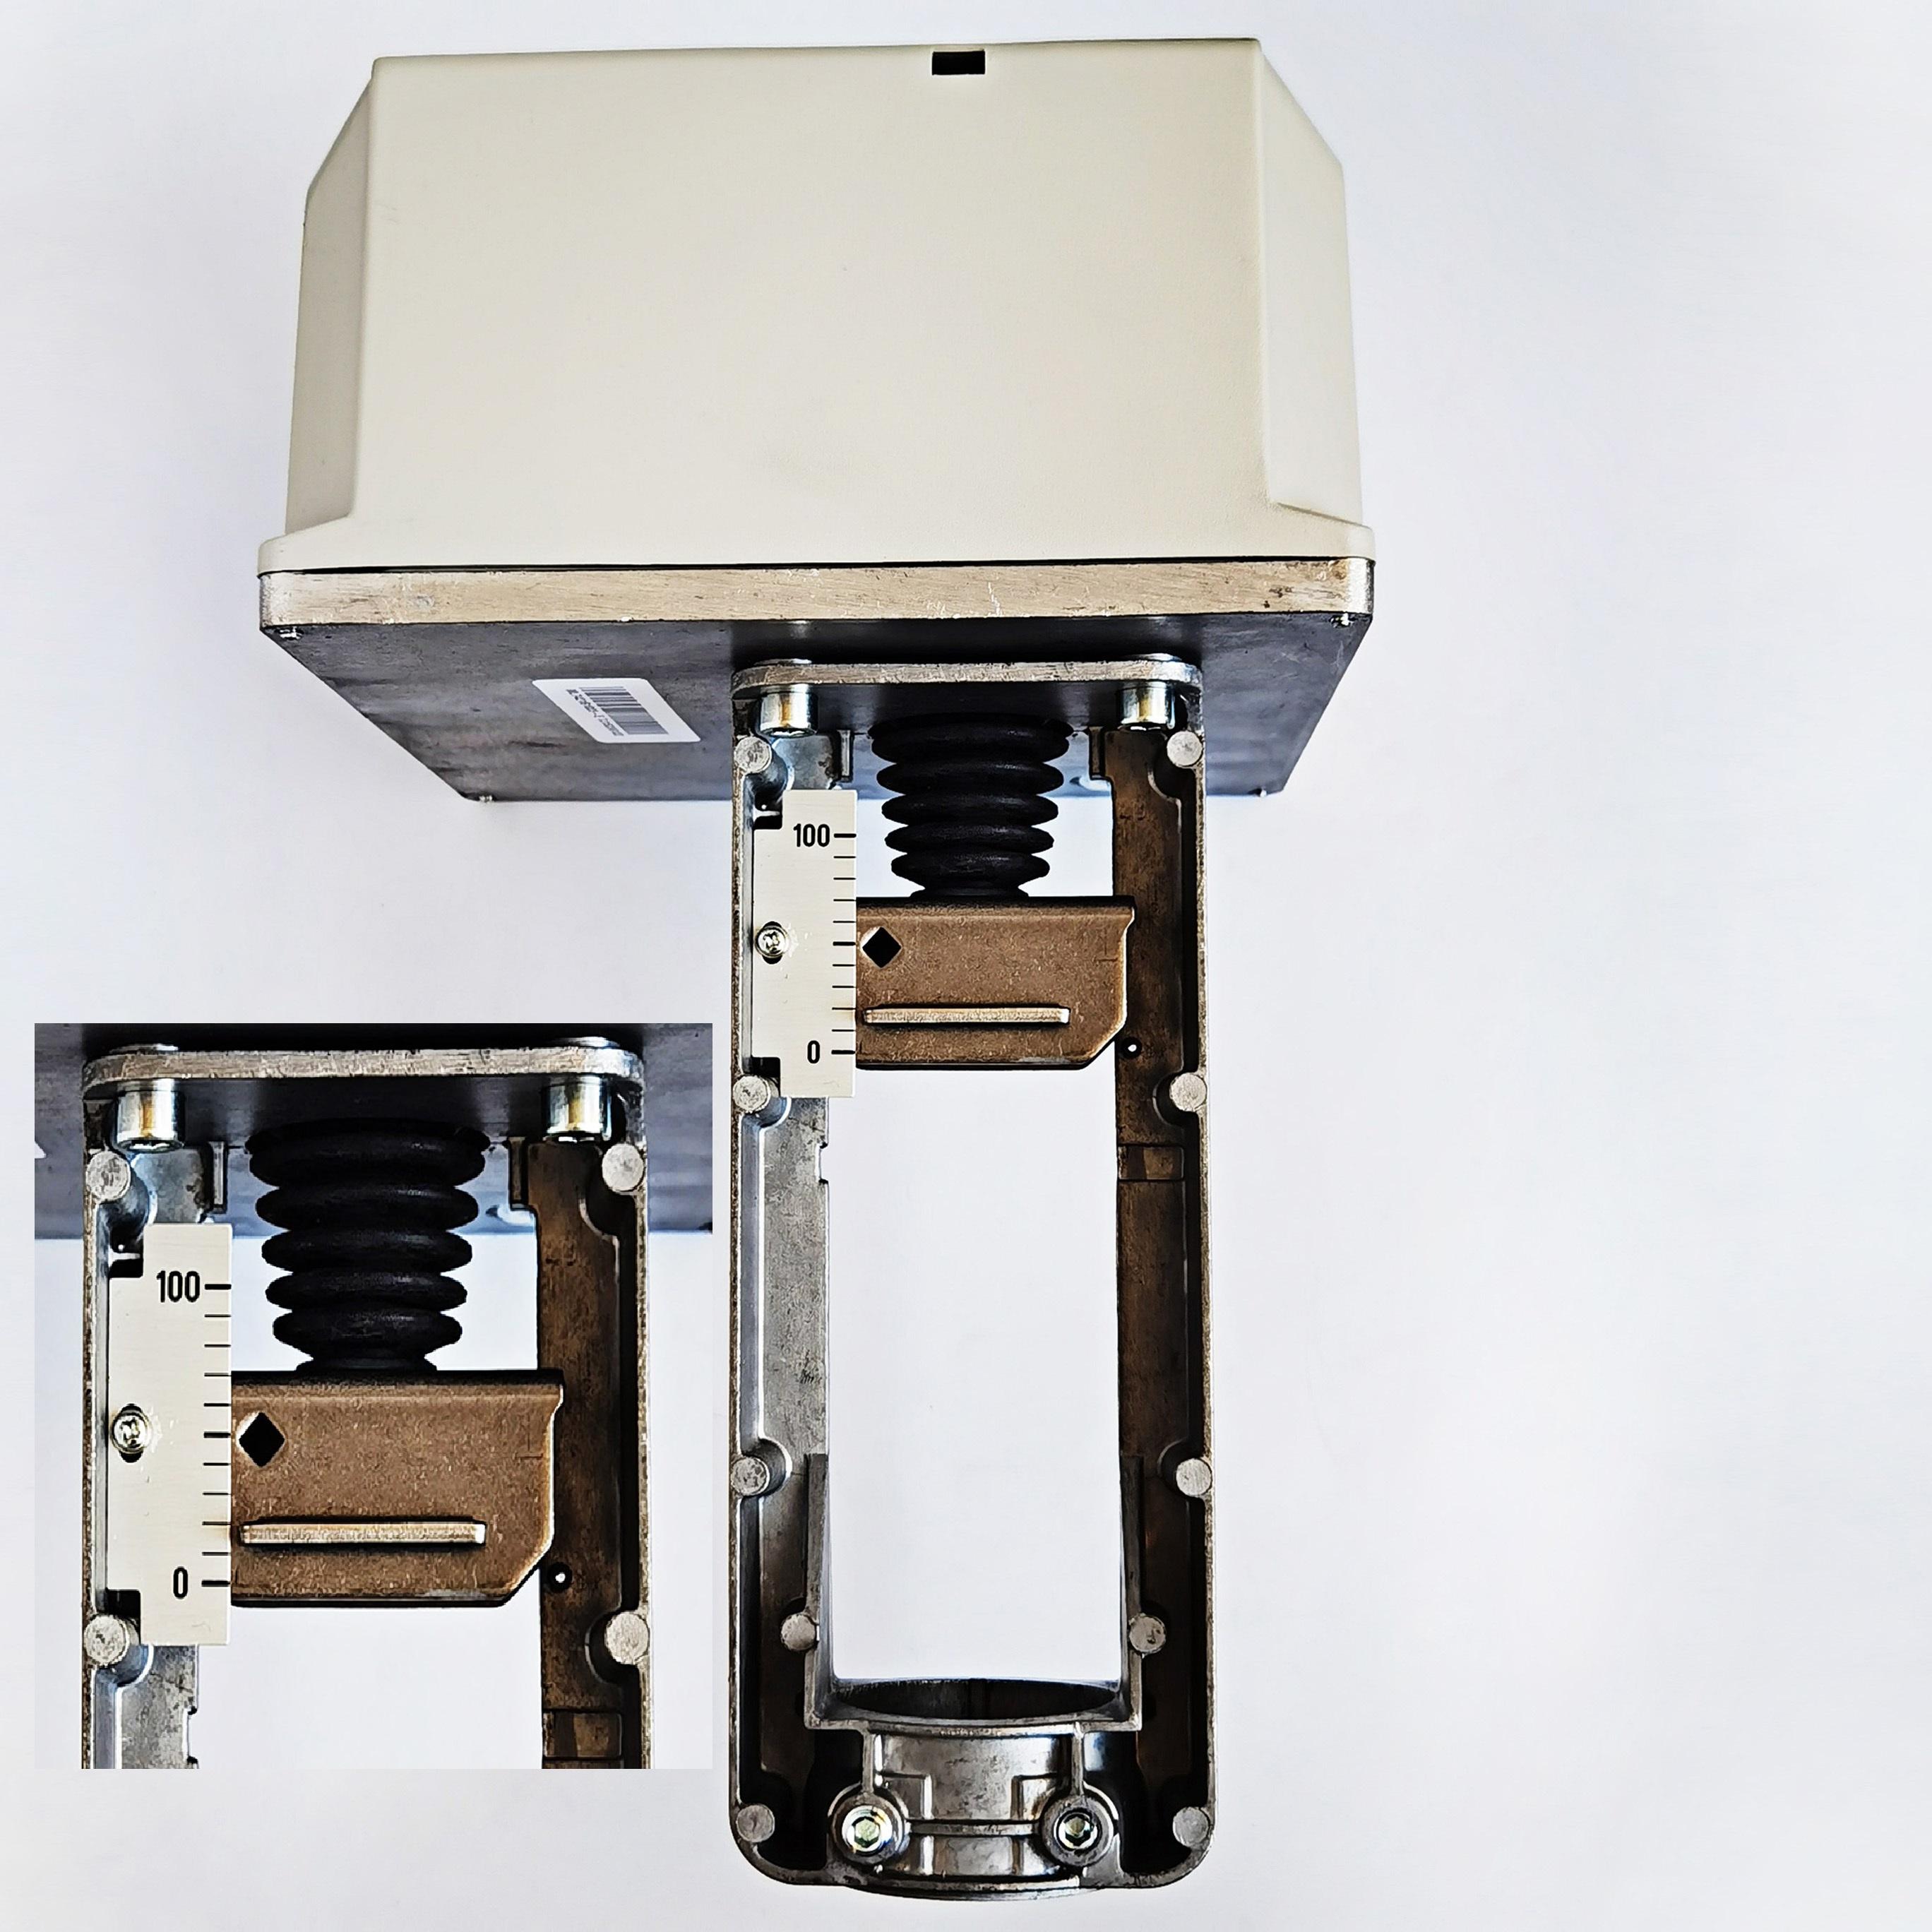 ML7421B1023-E 霍尼韦尔电动阀门驱动器